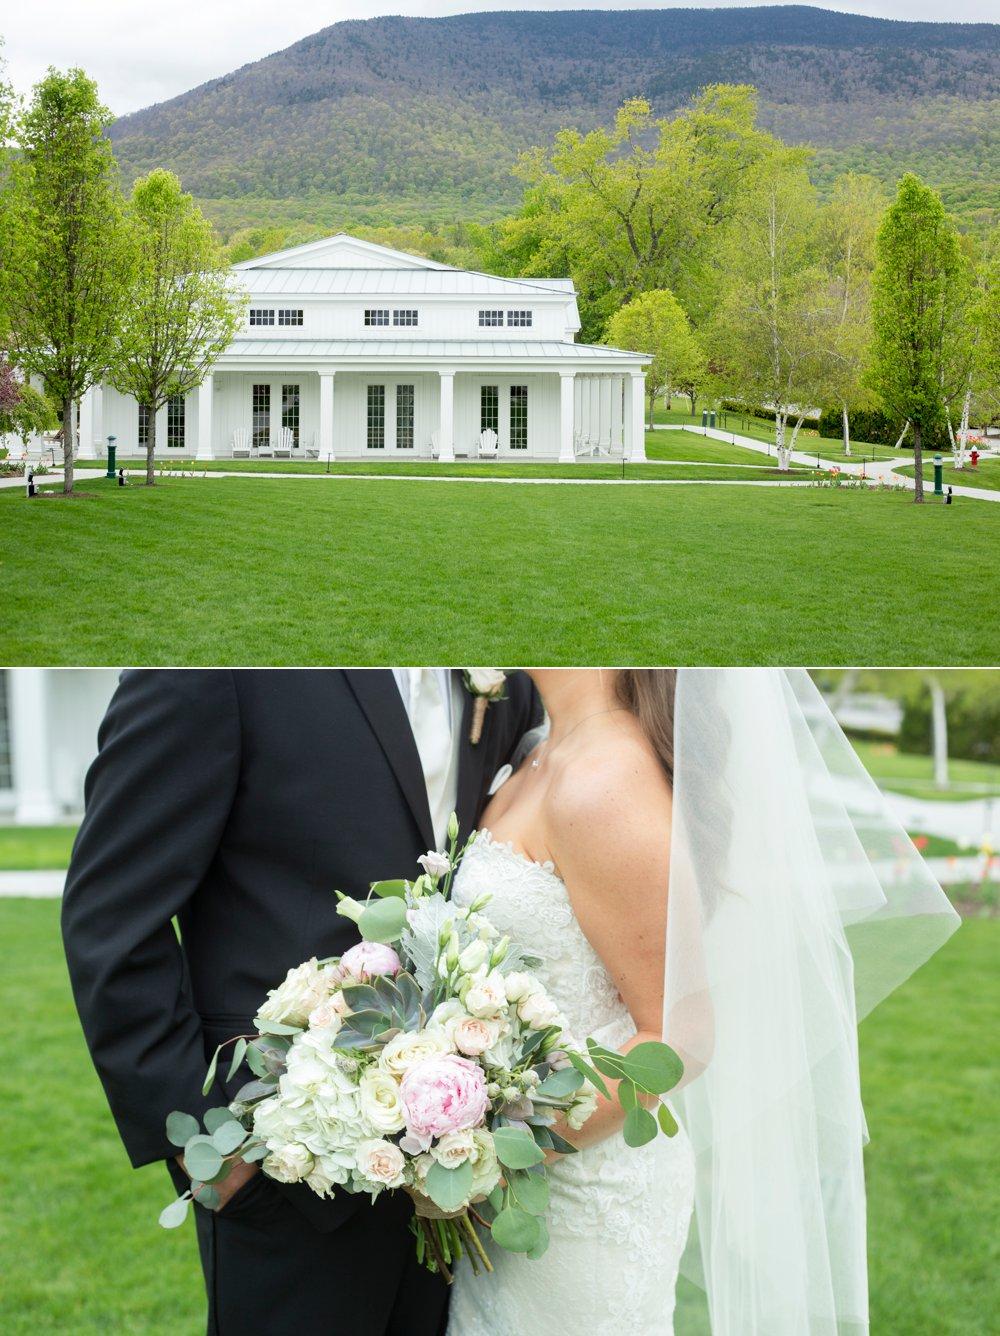 SomerbyJonesPhotography_EquinoxVermont_Wedding_0032.jpg